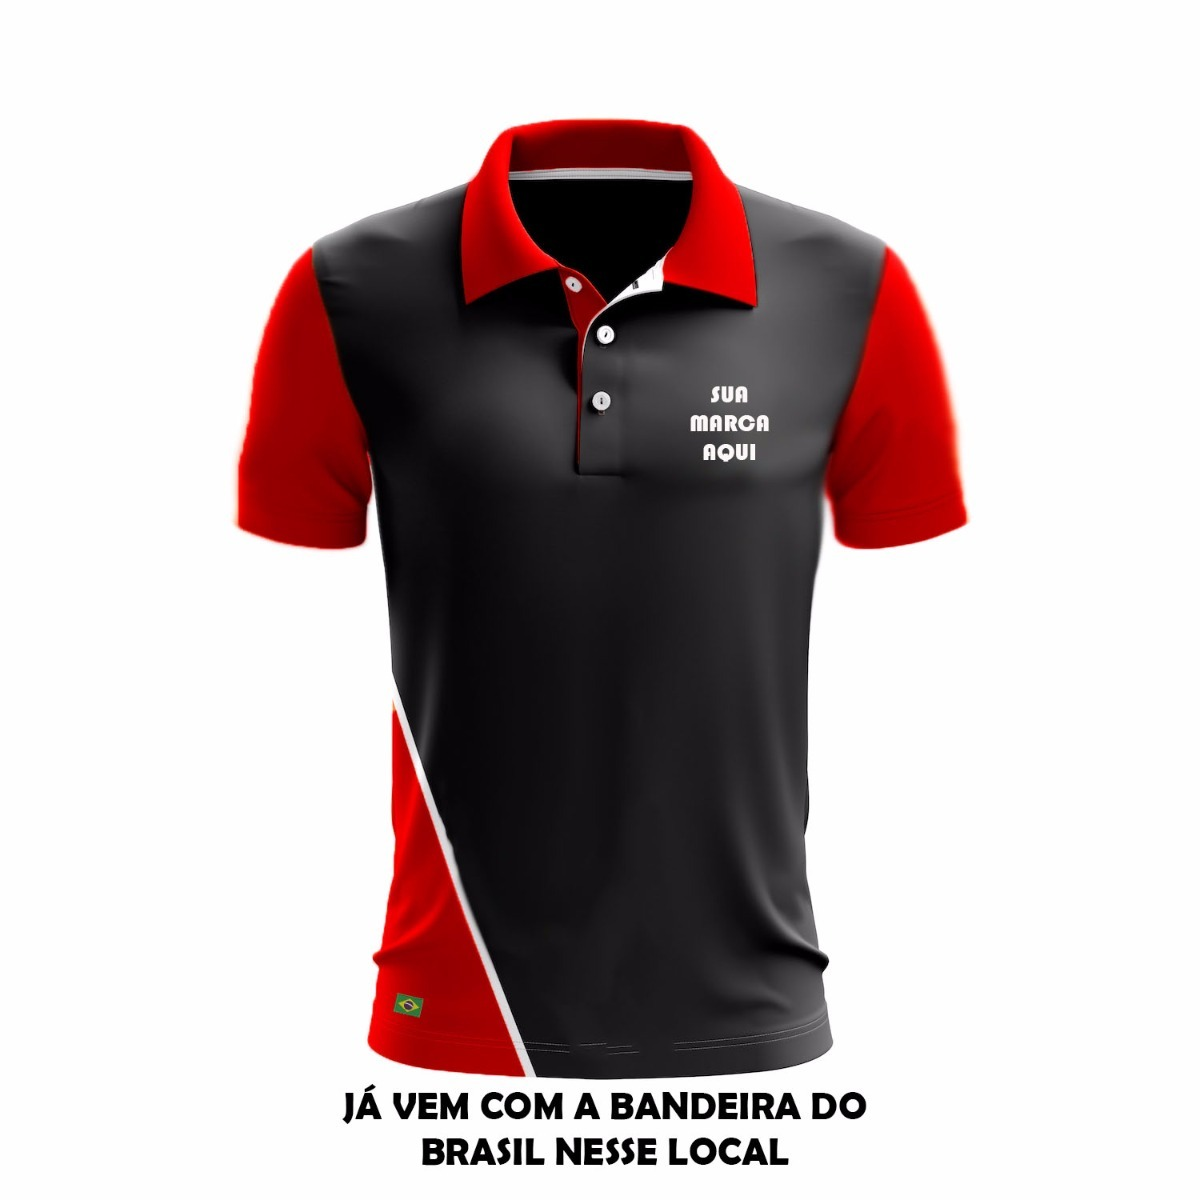 b75ec85d10 camisa polo personalizada uniforme - kit 4 unid. Carregando zoom.